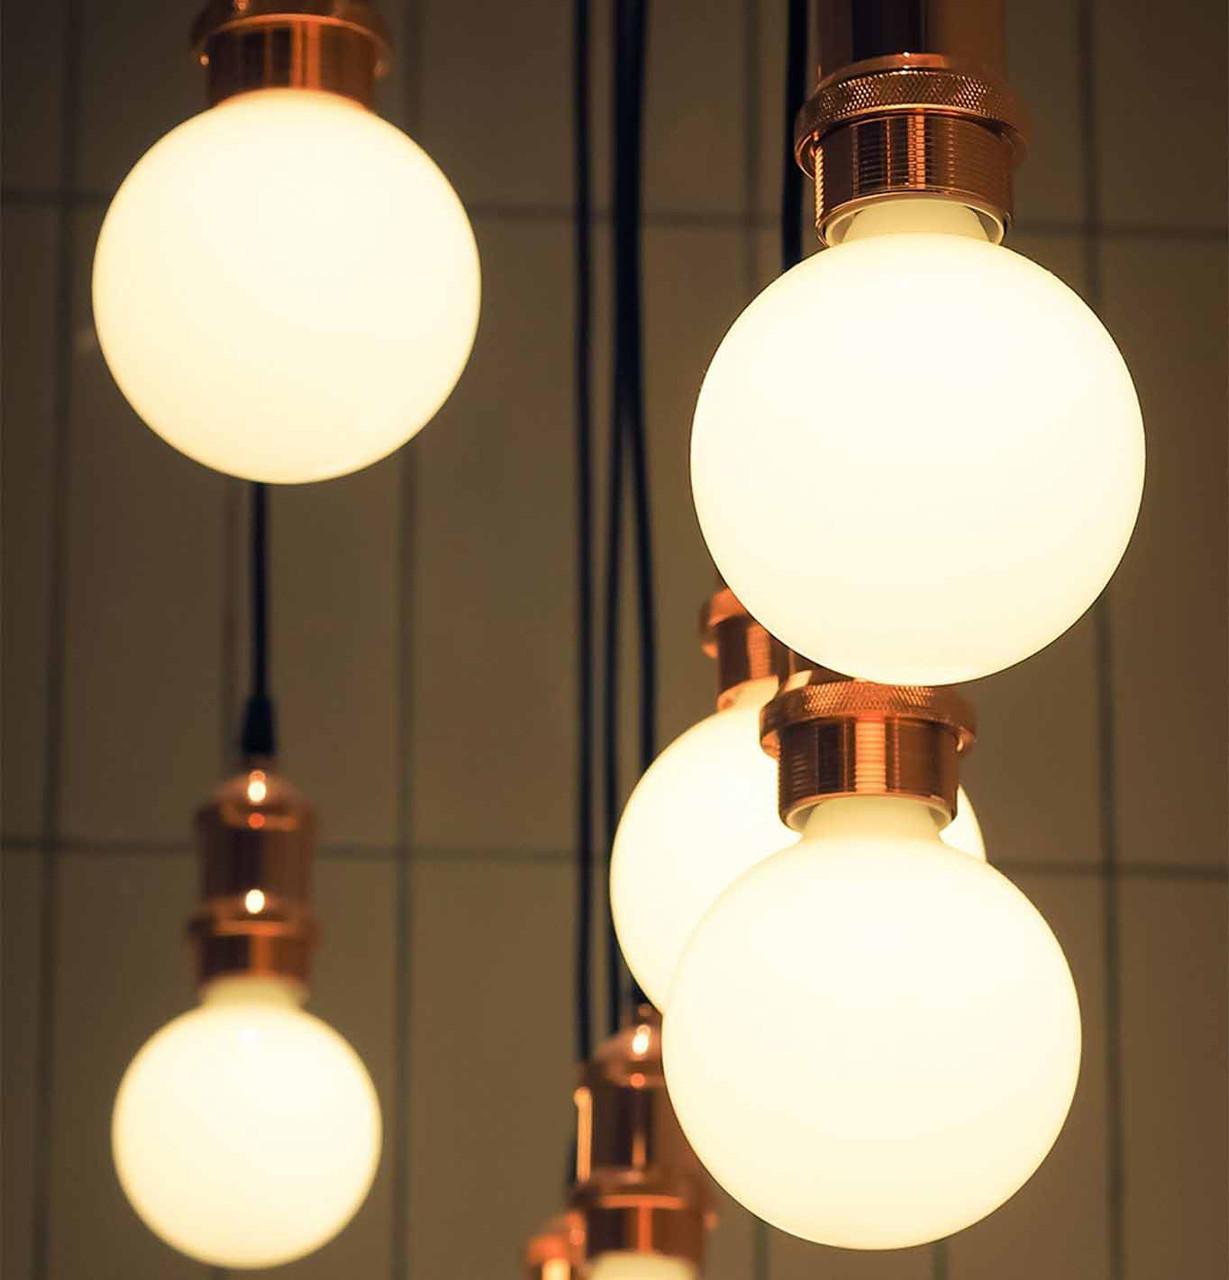 LED Globe Spiral Filament Light Bulbs